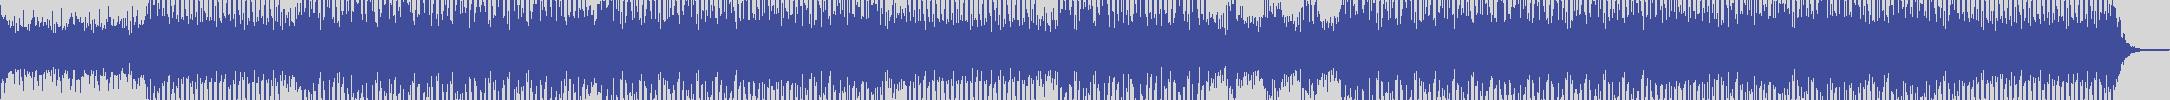 worldwide_music_records [WMR002] Max Riolo - Mental Distortion [Original Mix] audio wave form